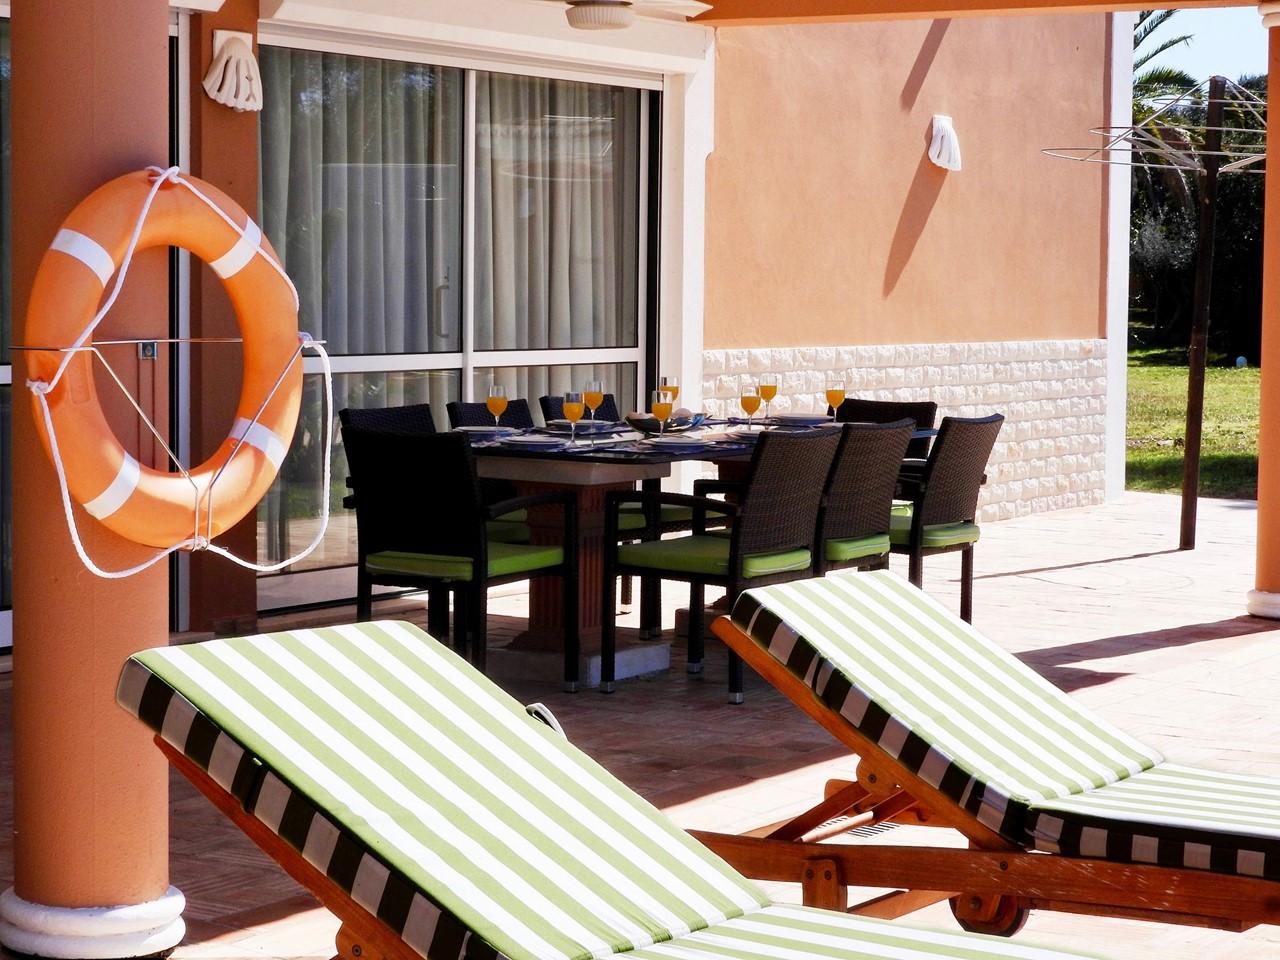 Sun loungers around the pool